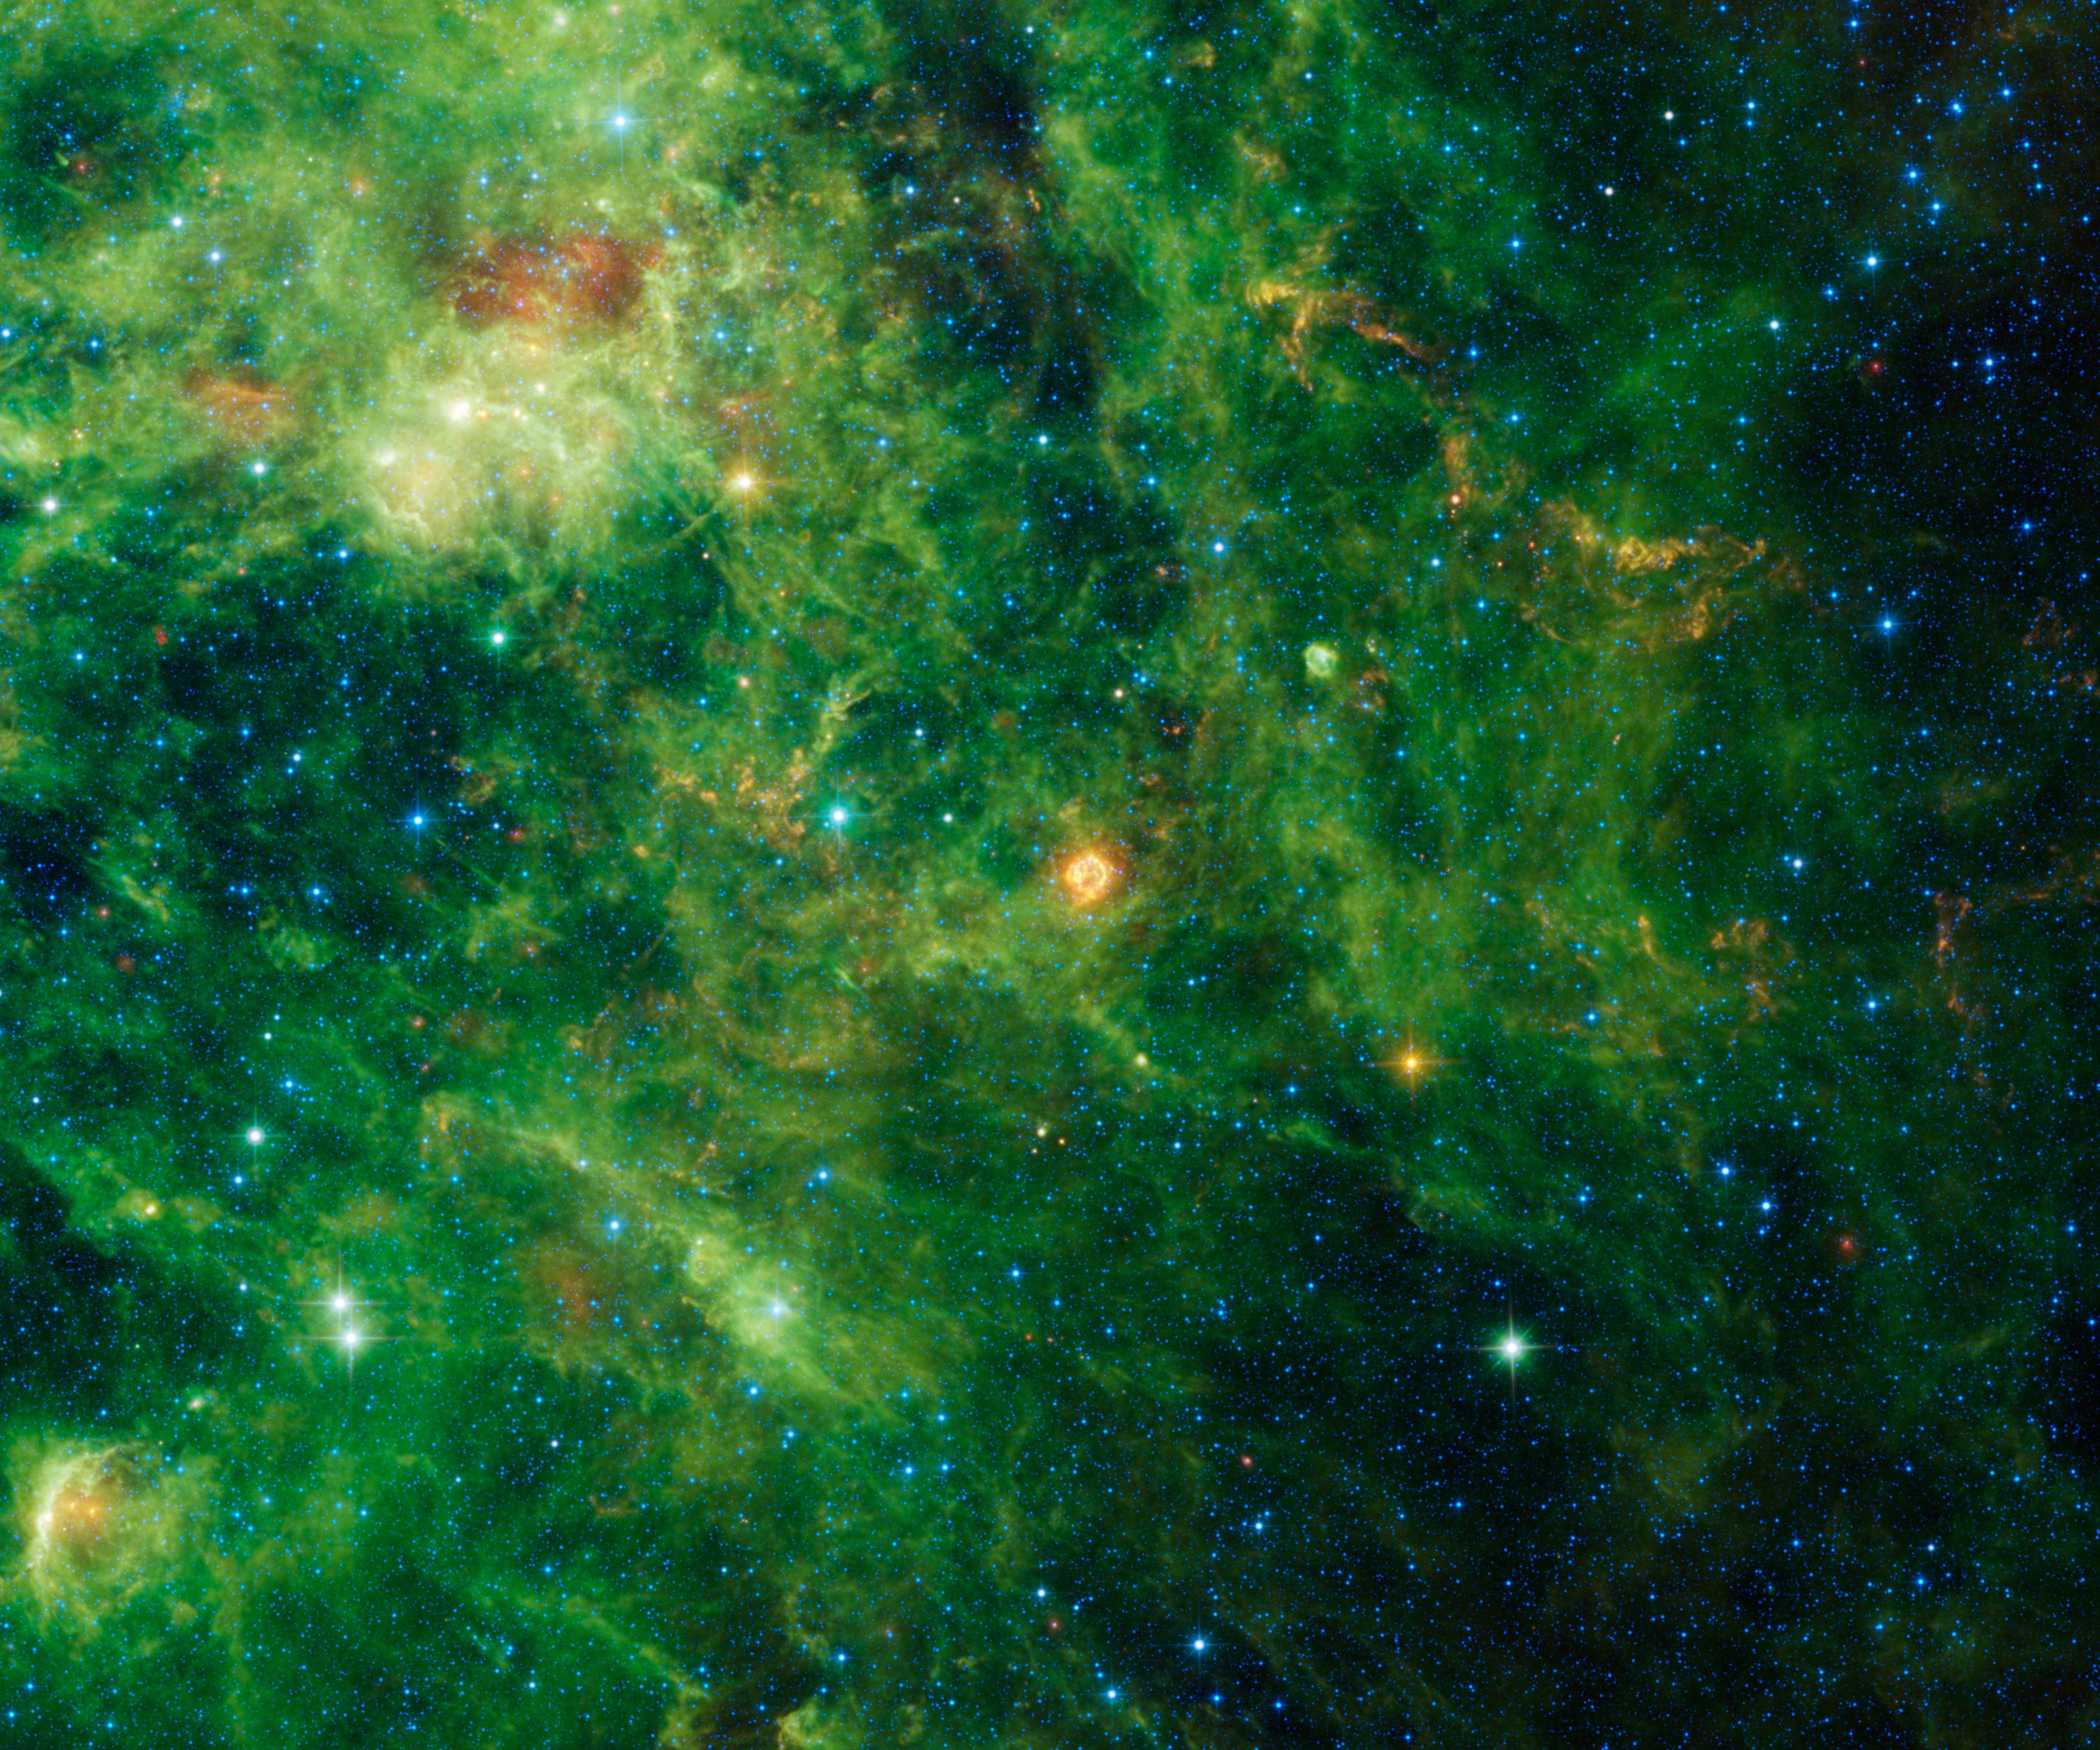 Vision of a Stellar Ending